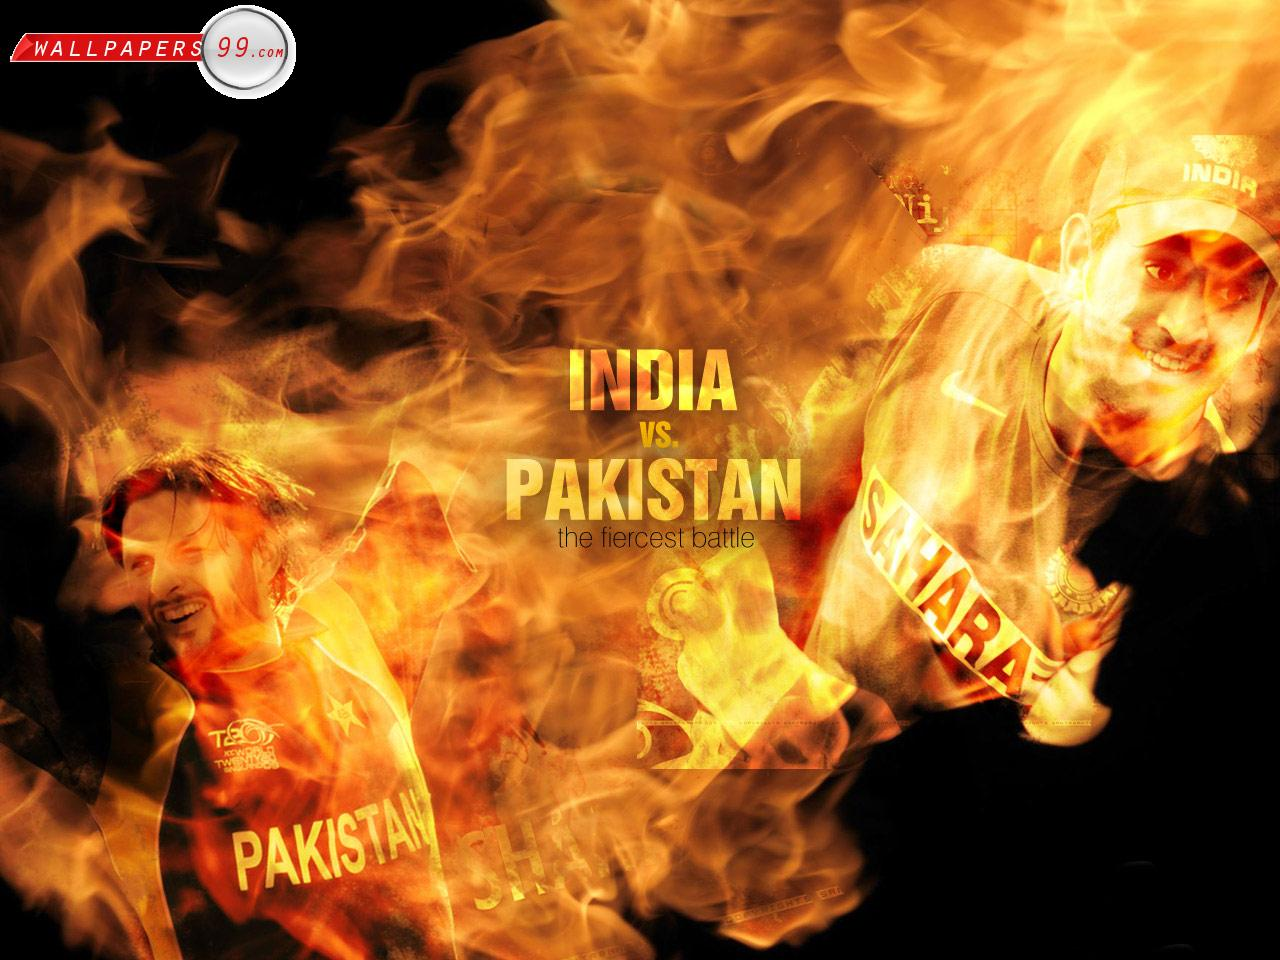 Icc cricket world cup t20 cricket world cup t20 2012 sri lanka premier league 2012 slpl - Pakistan cricket wallpapers hd ...